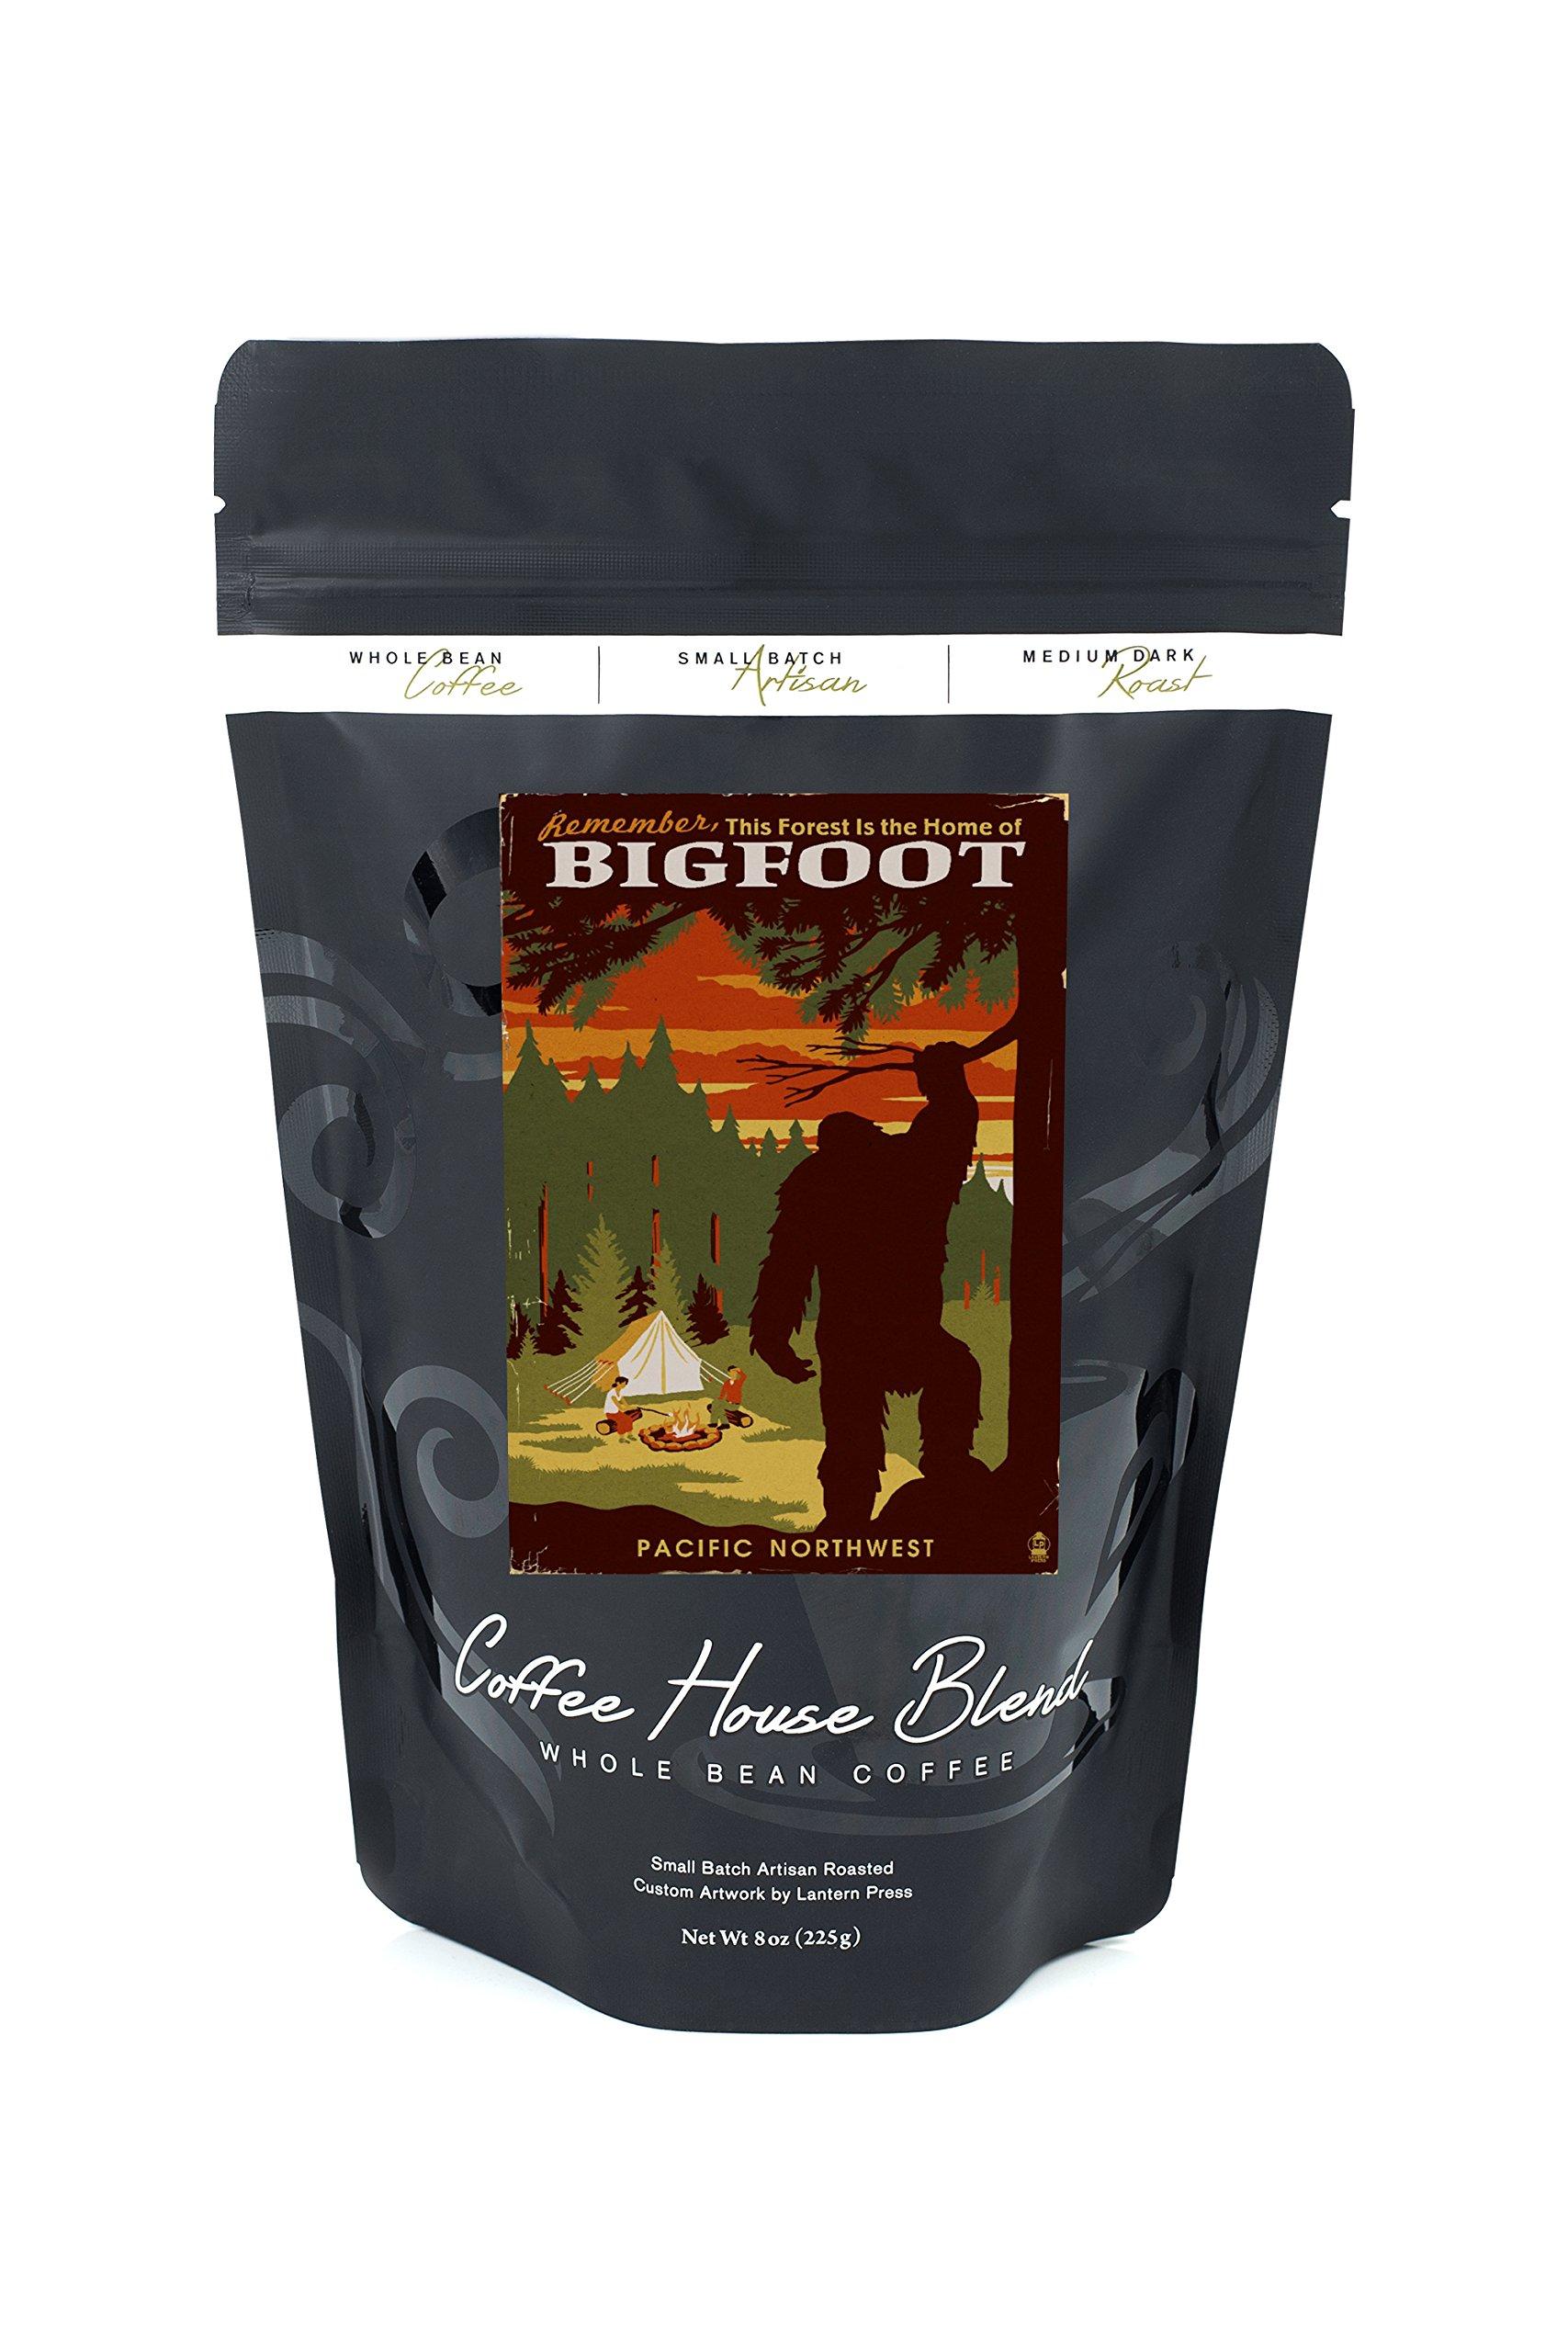 Pacific Northwest - Home of Bigfoot - WPA Style (8oz Whole Bean Small Batch Artisan Coffee - Bold & Strong Medium Dark Roast w/ Artwork)